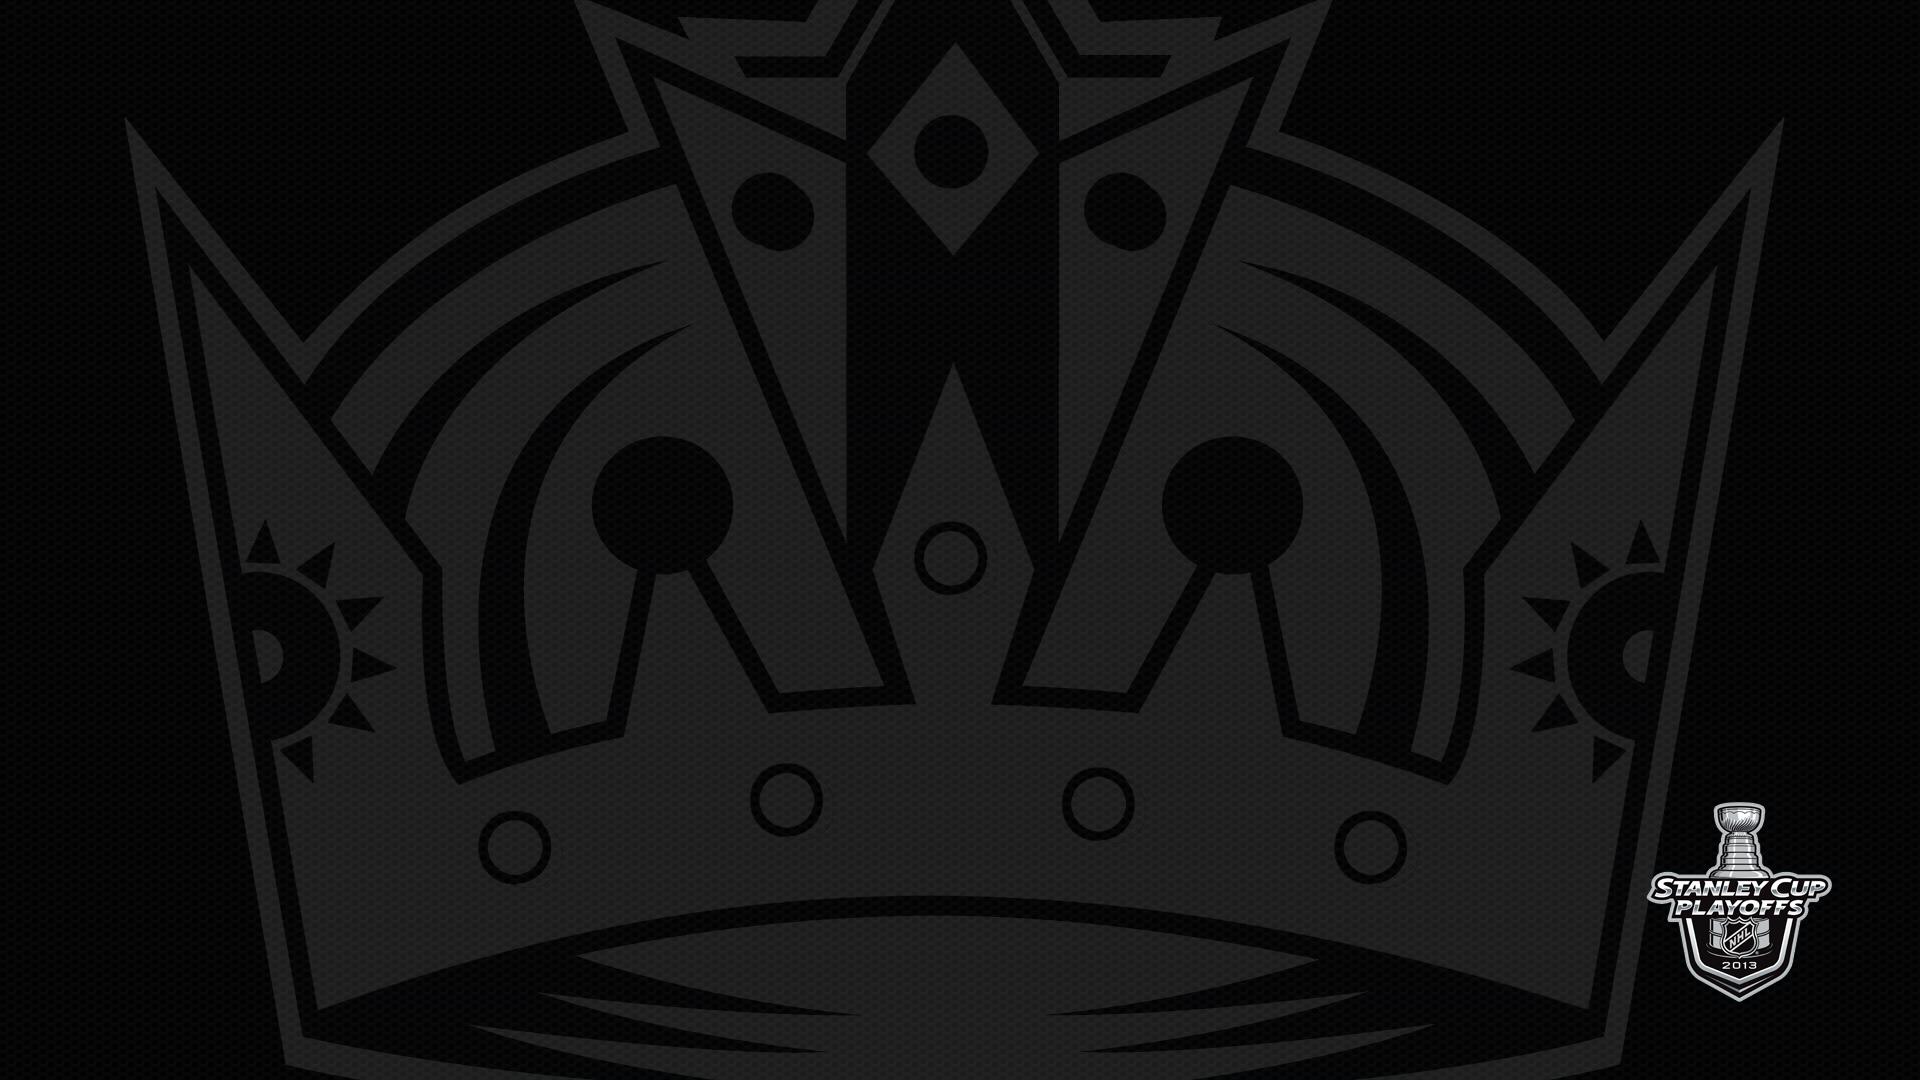 Kings 1920x1080 by bruins4life on deviantart kings 1920x1080 by bruins4life kings 1920x1080 by bruins4life voltagebd Choice Image